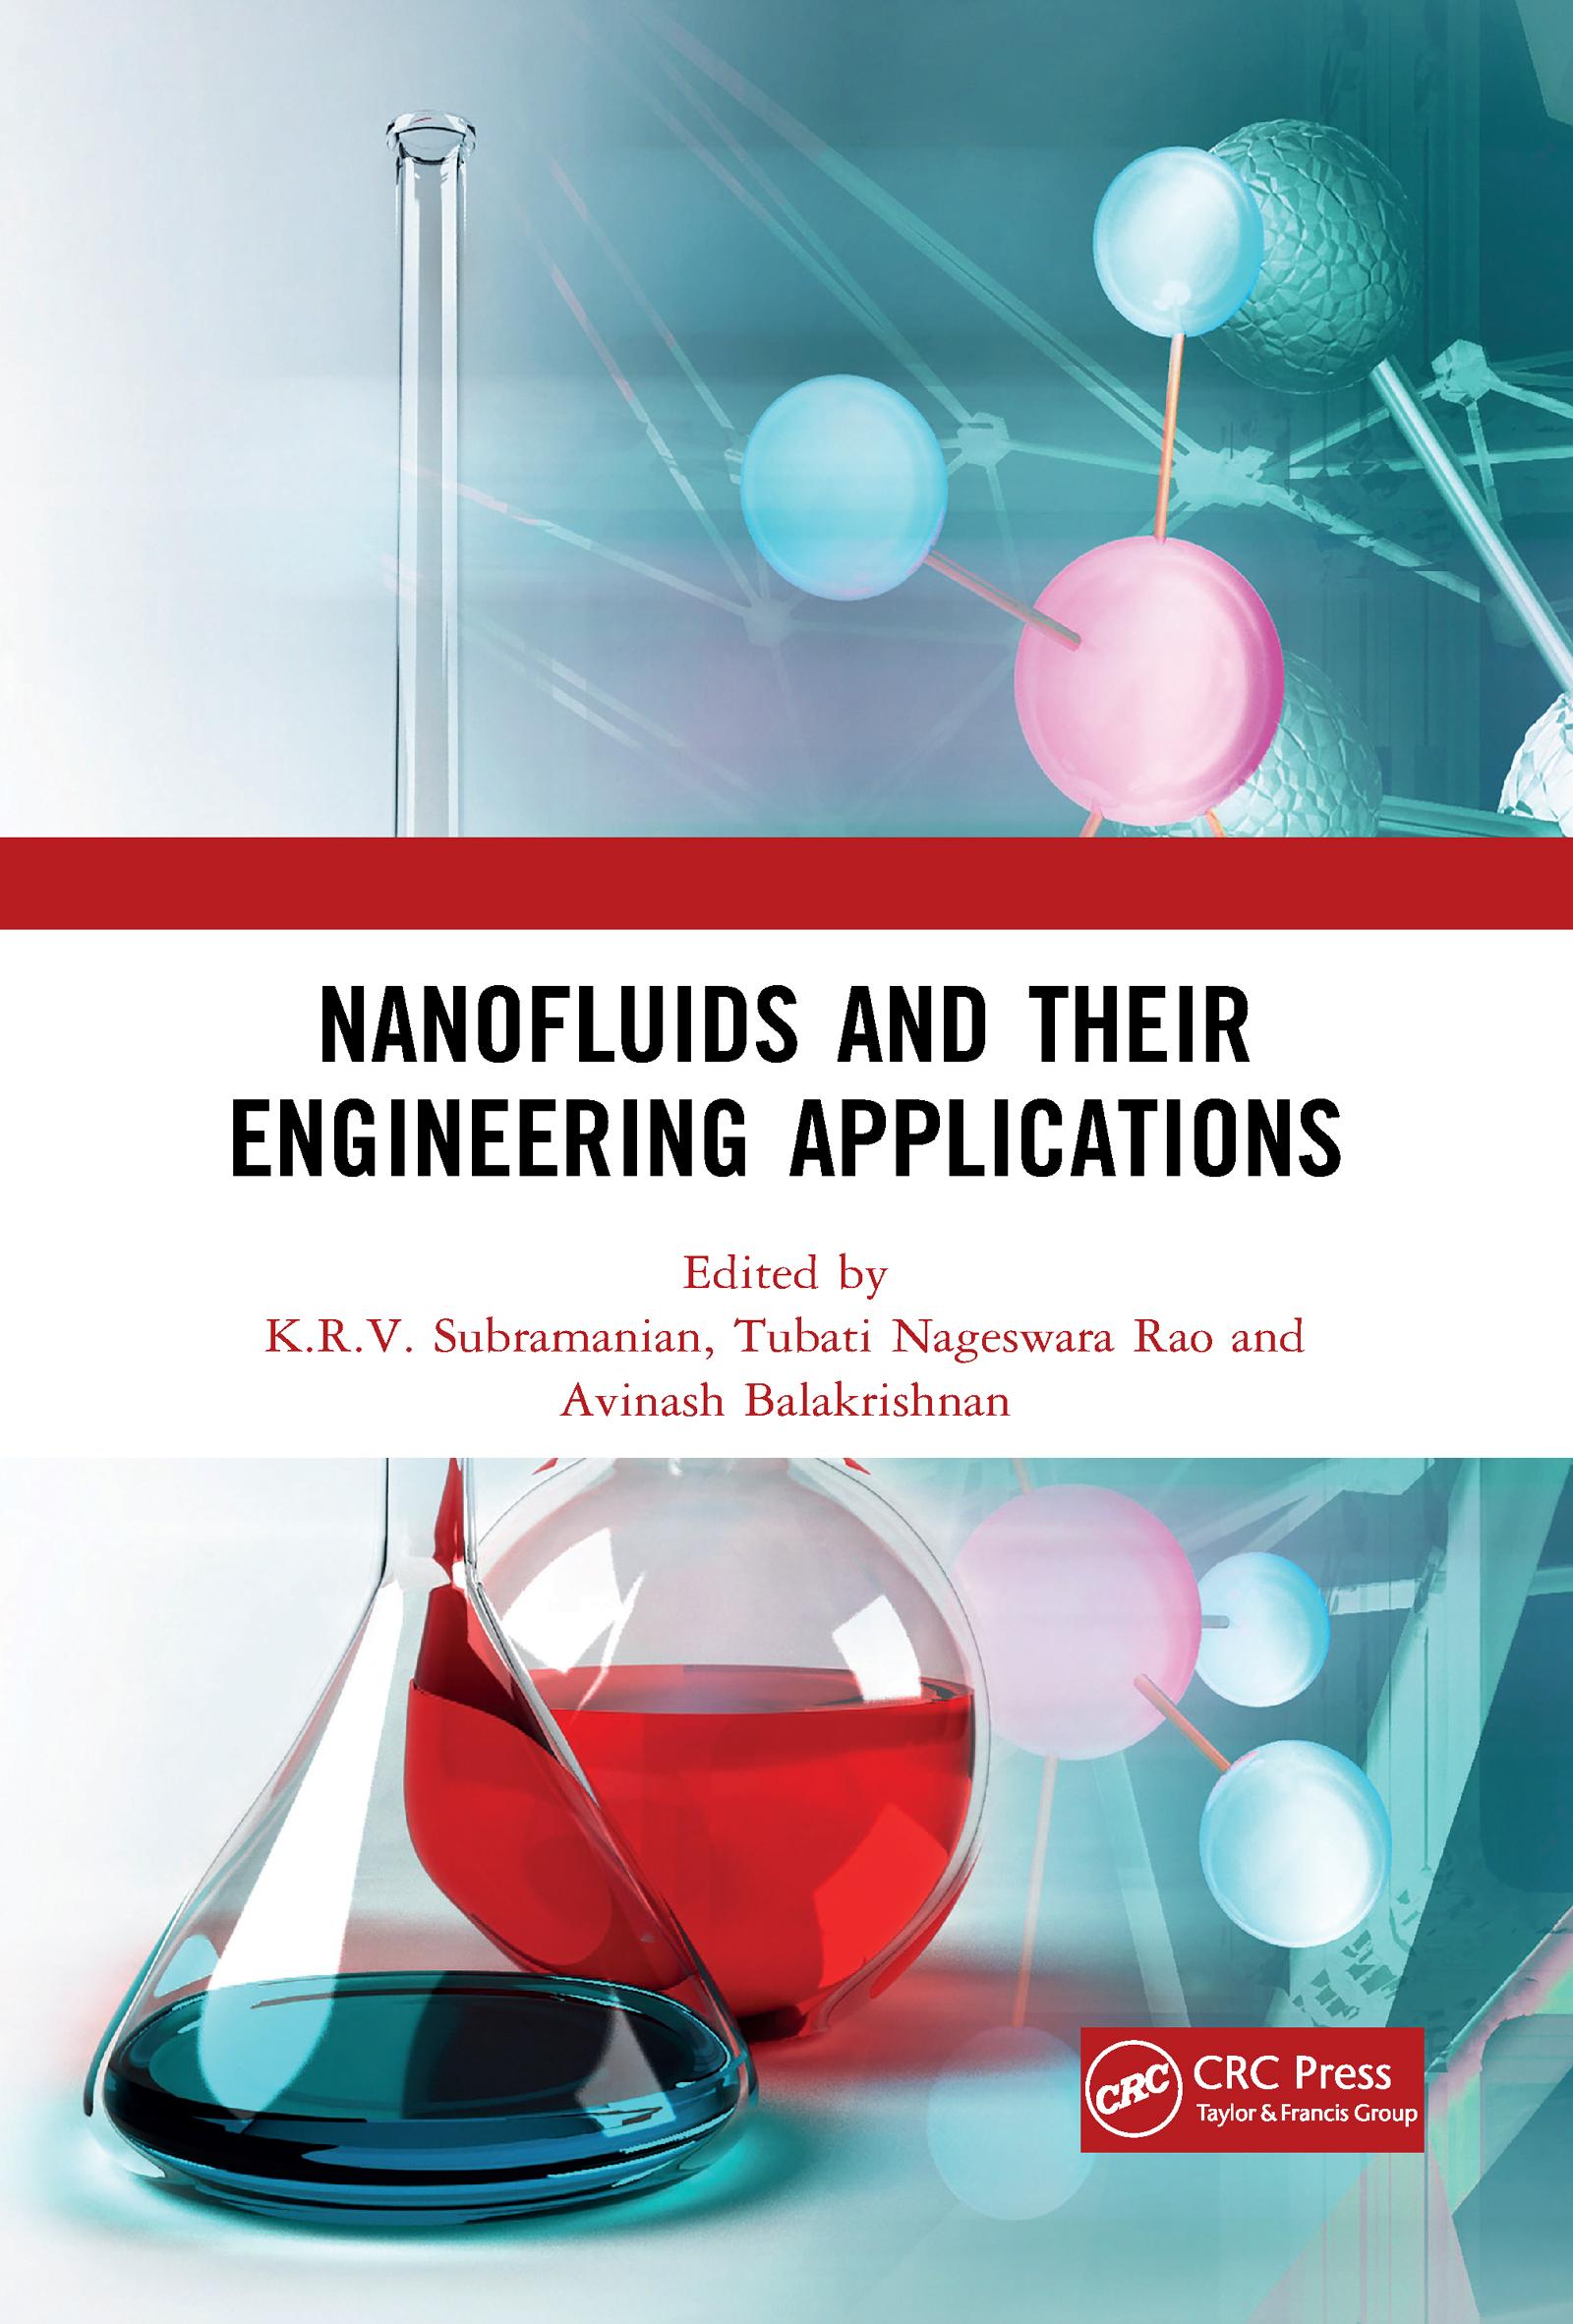 Nanofluids and Their Engineering Applications